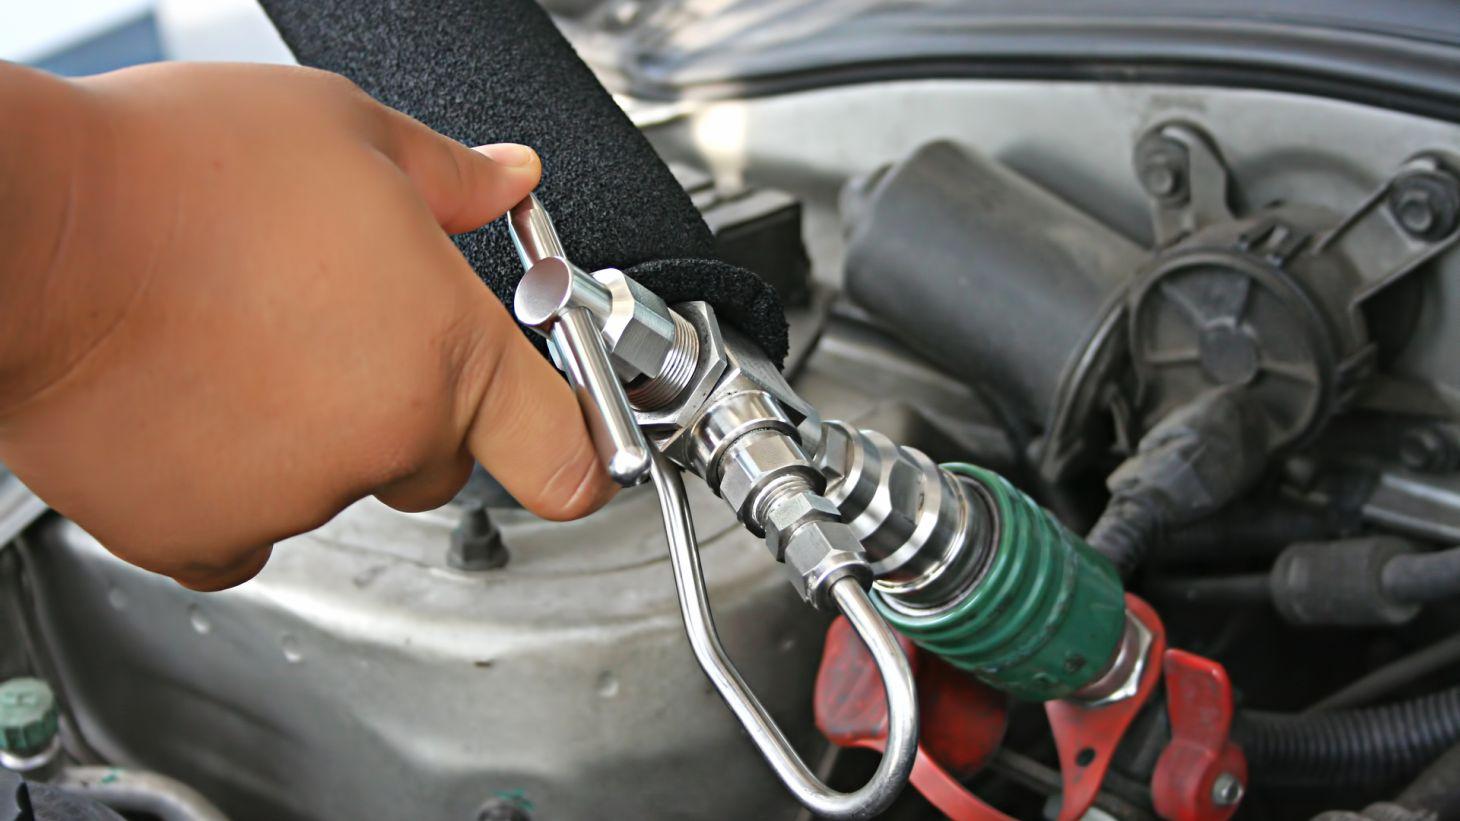 frentista posto conbustivel abastecendo carro mivido gnv gas natural veicular